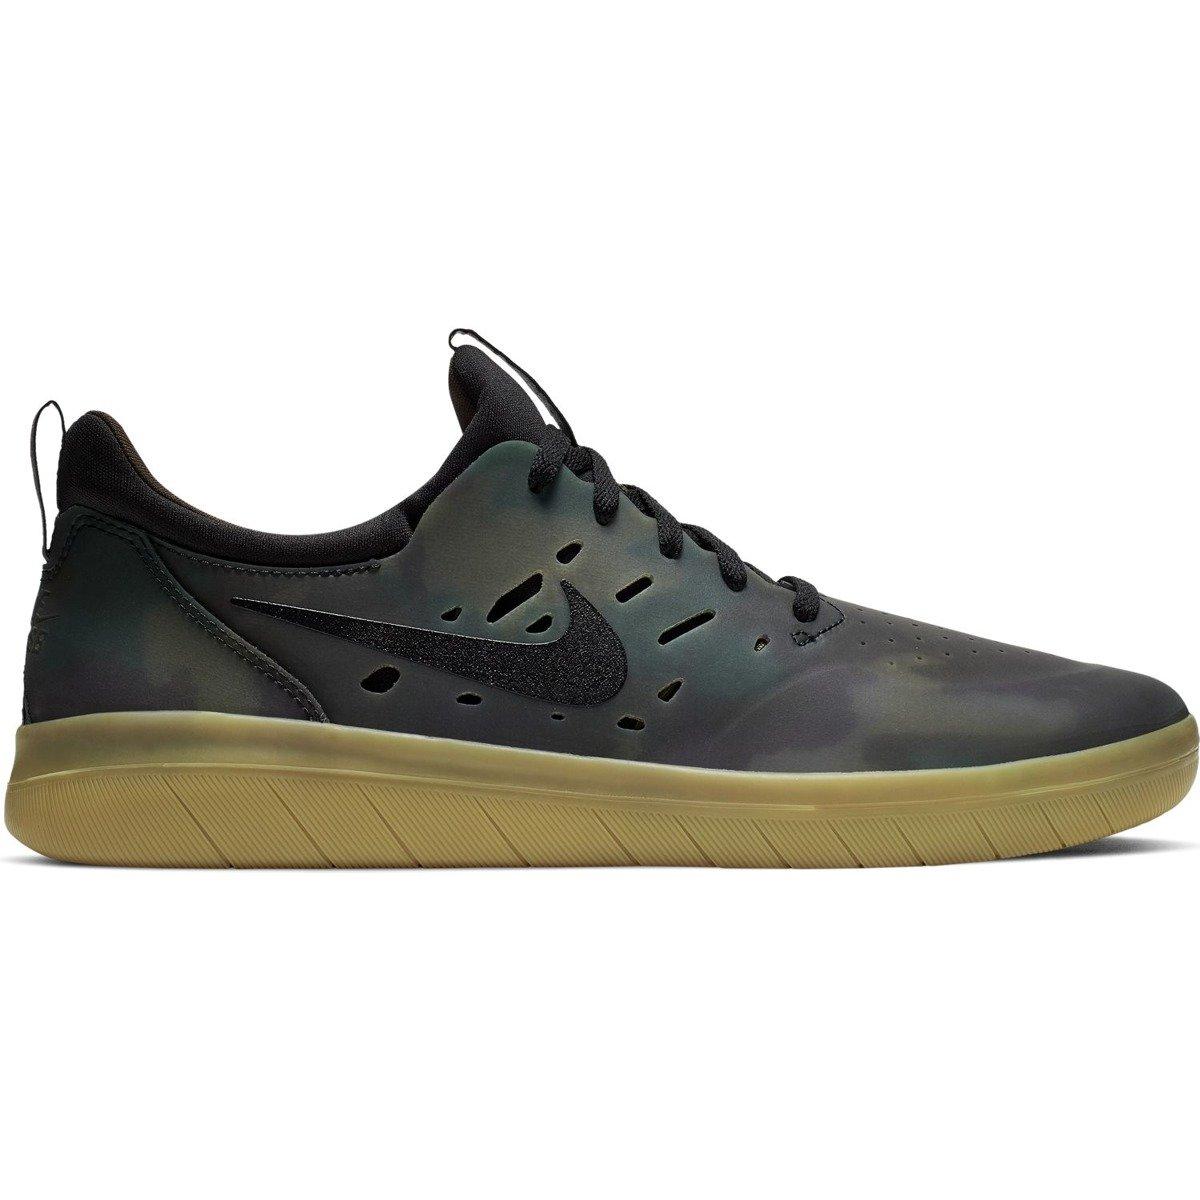 75f1338da7f86 Nike Sb Nyjah Free Premium Multi-color black-gum Light Brown green ...